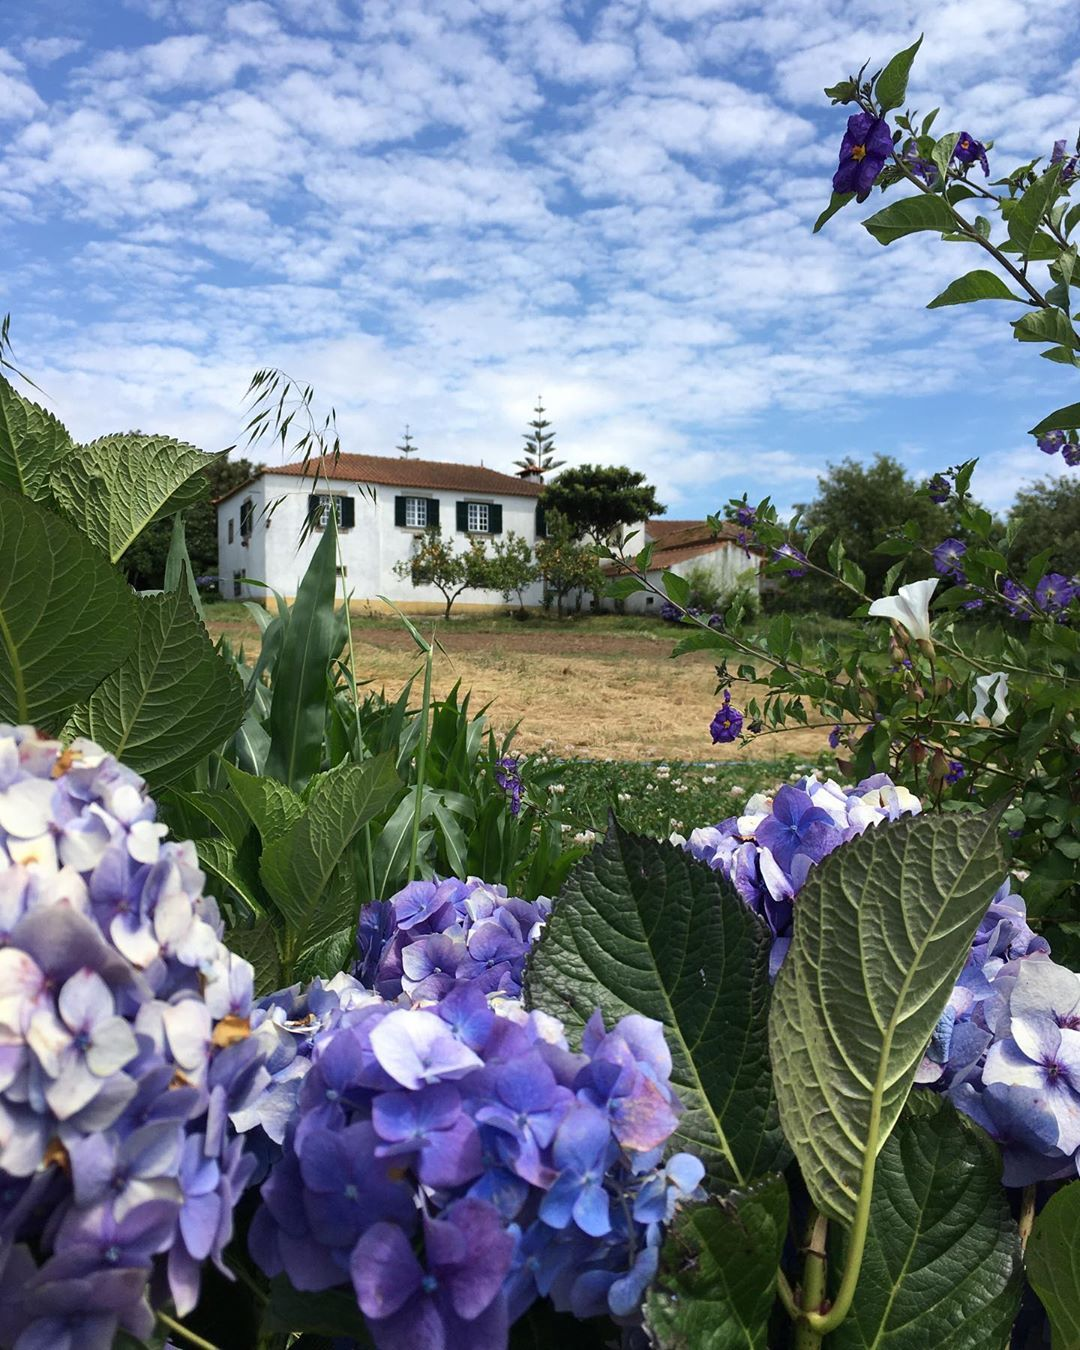 #countryside#natur#naturephotography#nature#natureza#naturelovers#natures#portugal#loveportugal#portugallovers#portugalovers#travel#portugaldenorteasul#portugalemclicks#recantosdeportugal#maia#visitportugal#portugal_photos#portugaltravel#portugal_a_gramas#portugalemperspectiva#portugalemcliks#portugal_em_fotos#portugal_places#maiaportoportugal#portugal_vision#portugal_gems#portugaldenorteasul#visitportugal#loveportugal#photographylovers#phototravel#country